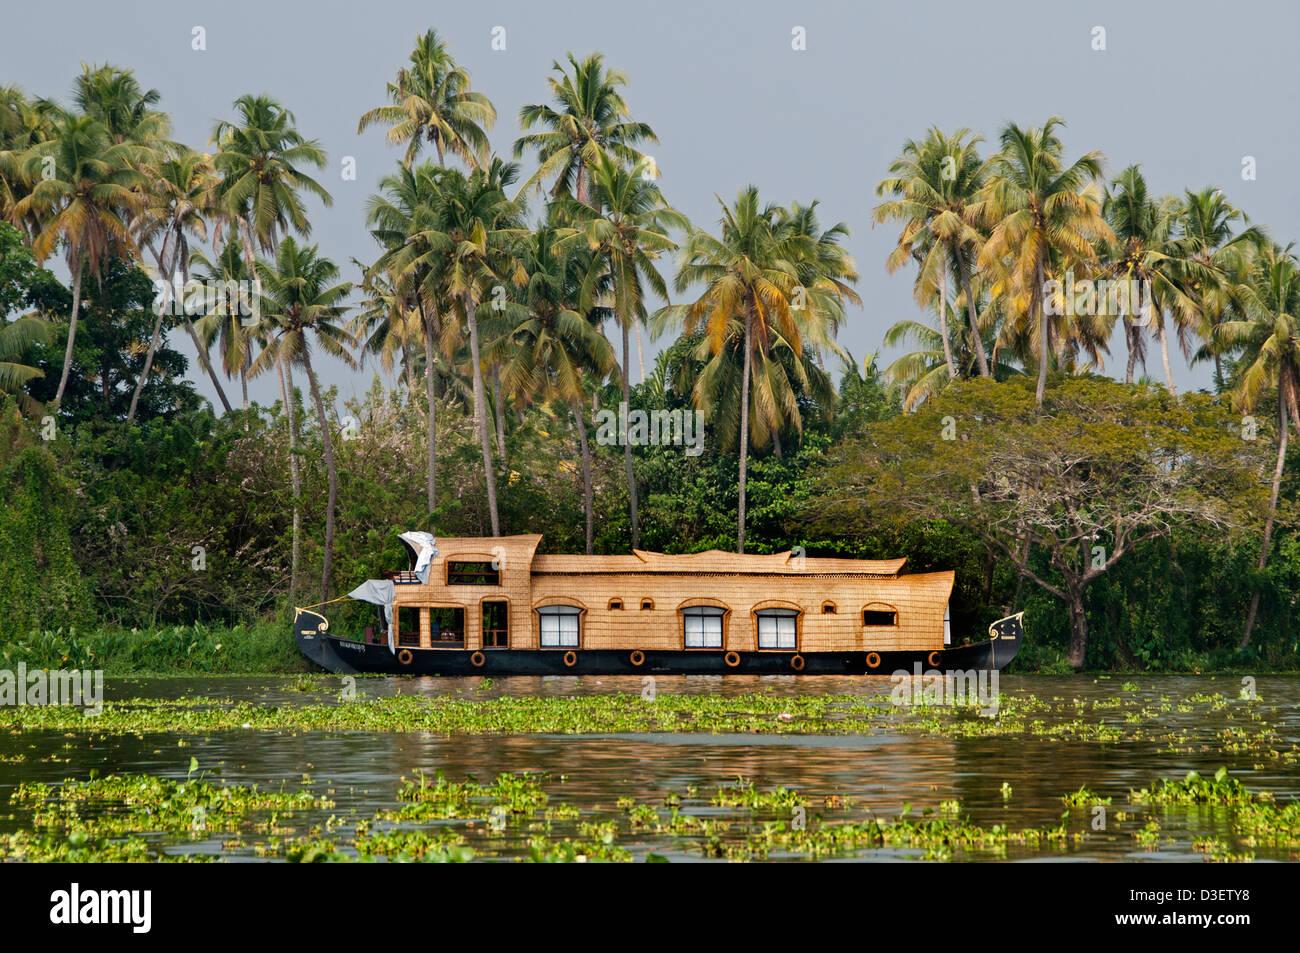 Houseboats Backwaters vicino a Alappuzha (Alleppey), Kerala India Immagini Stock